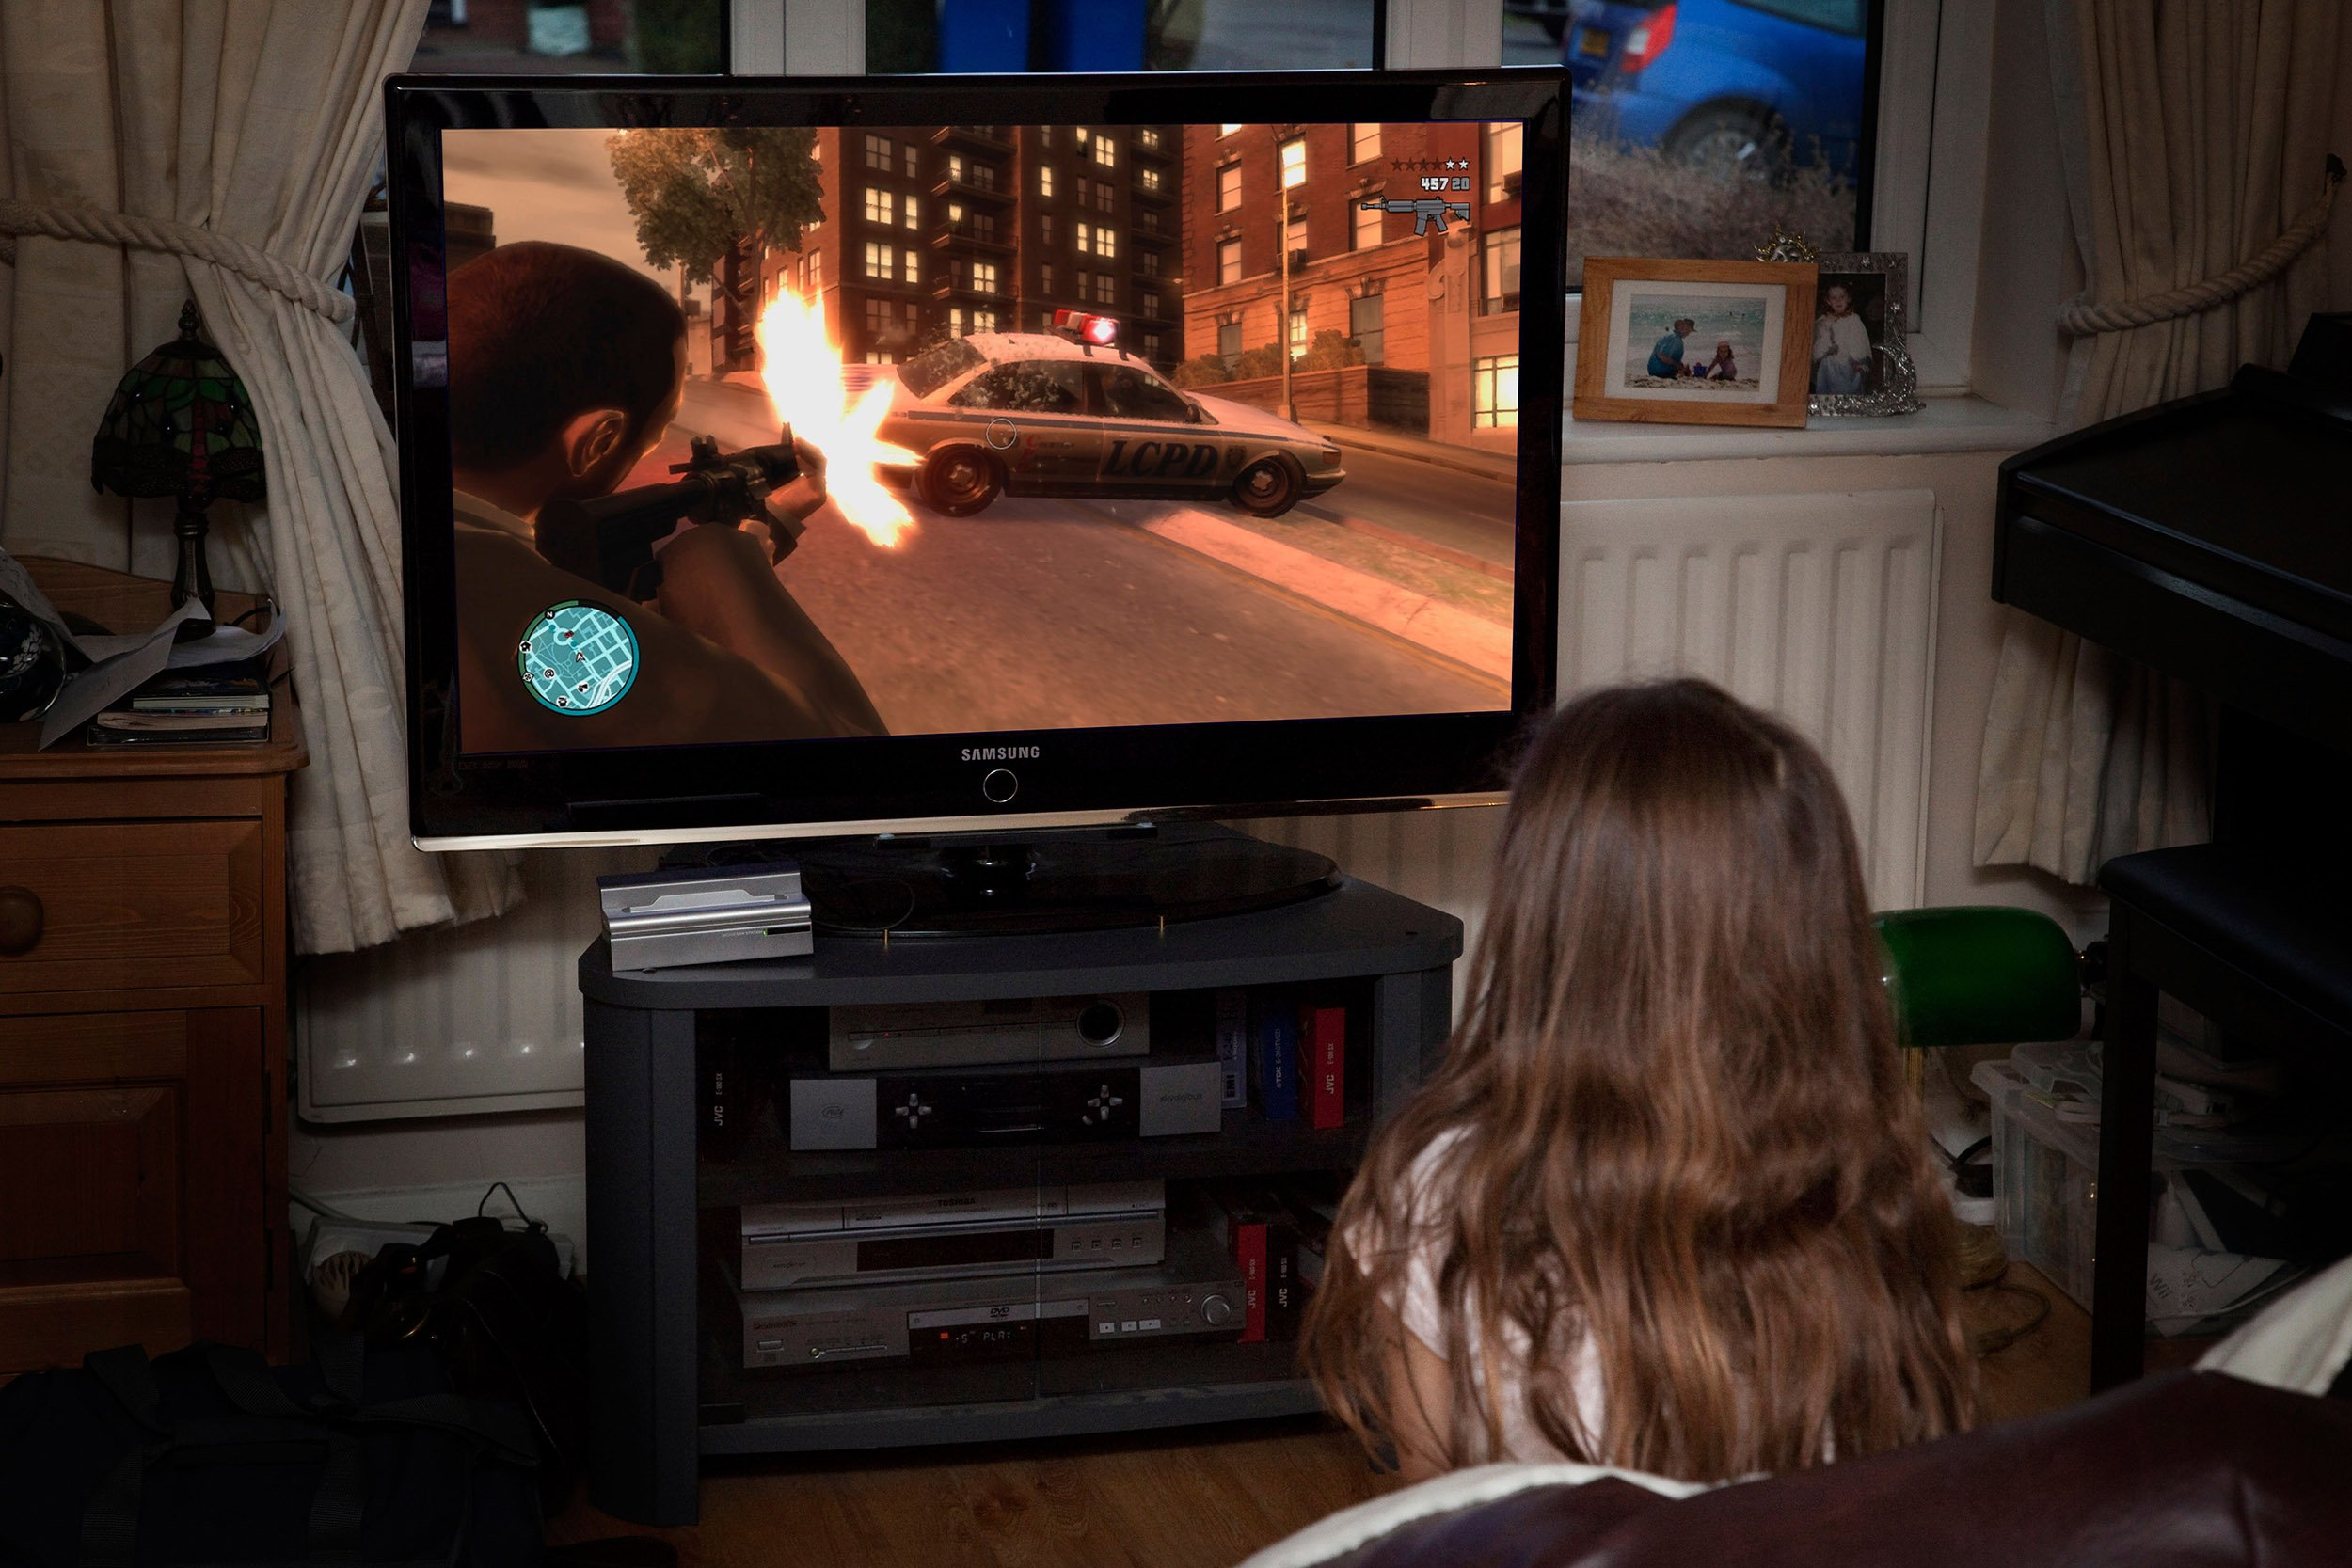 Violent Video Games Cause Behavior Problems problems cause behavior